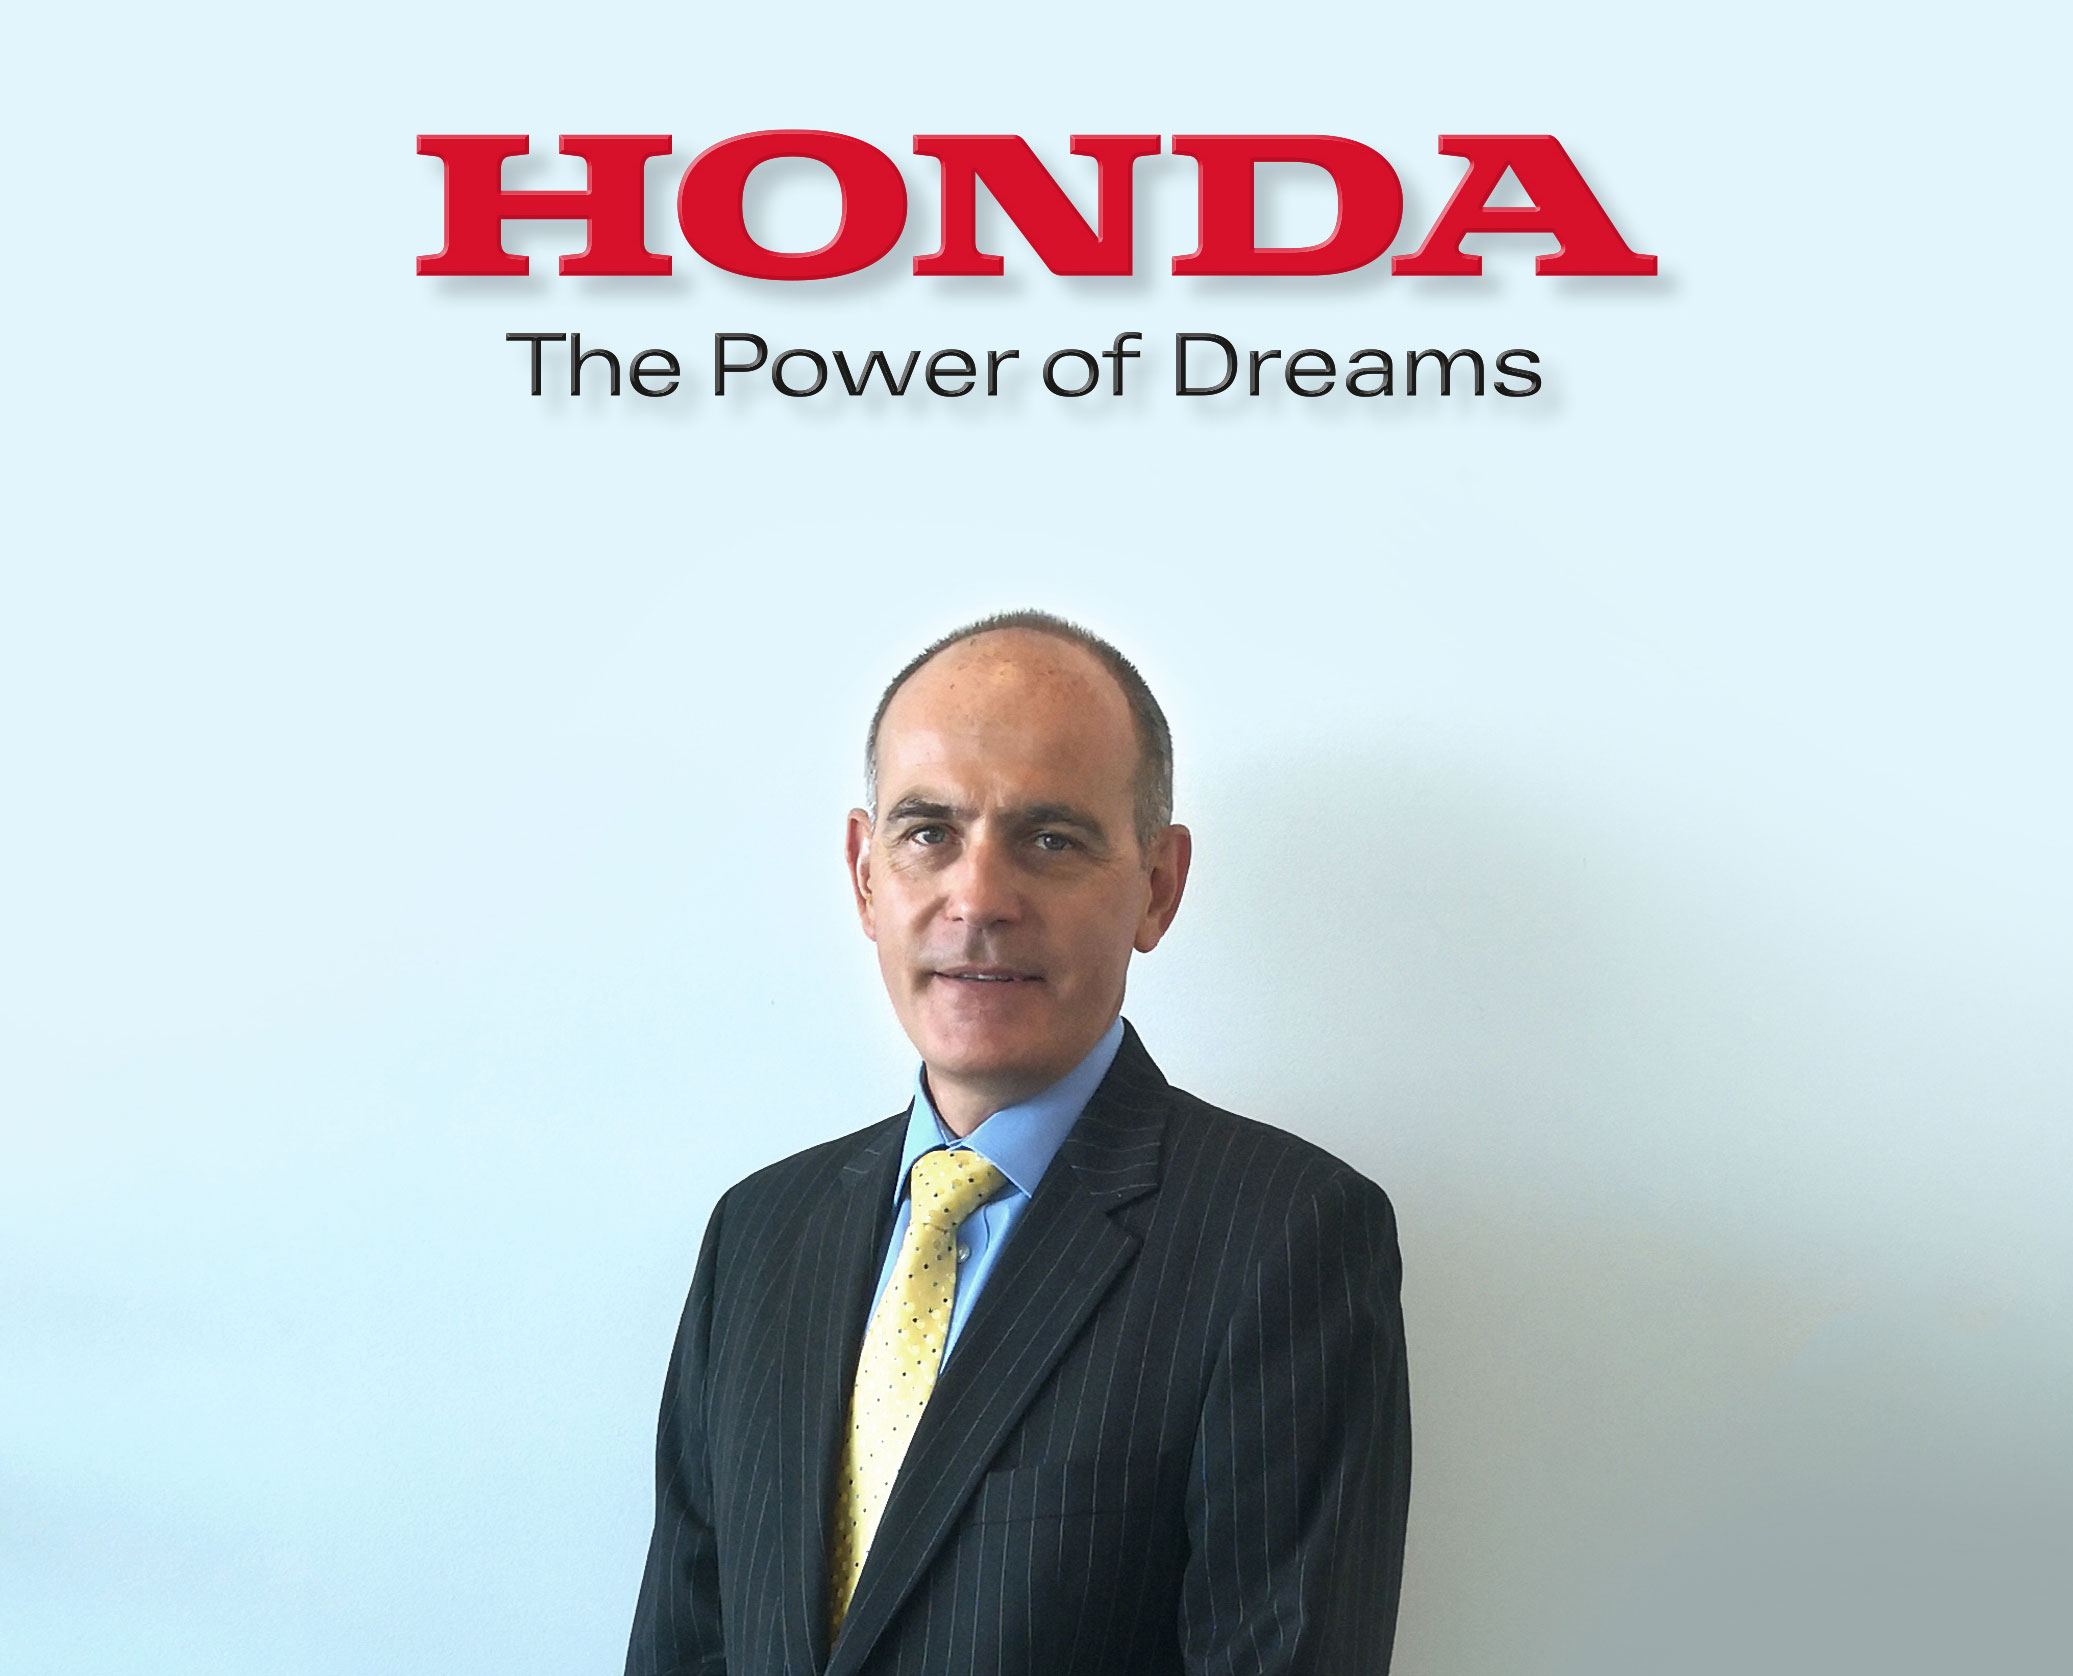 Al-Futtaim's Trading Enterprises Announces New Leadership For Honda Uae Brand Division